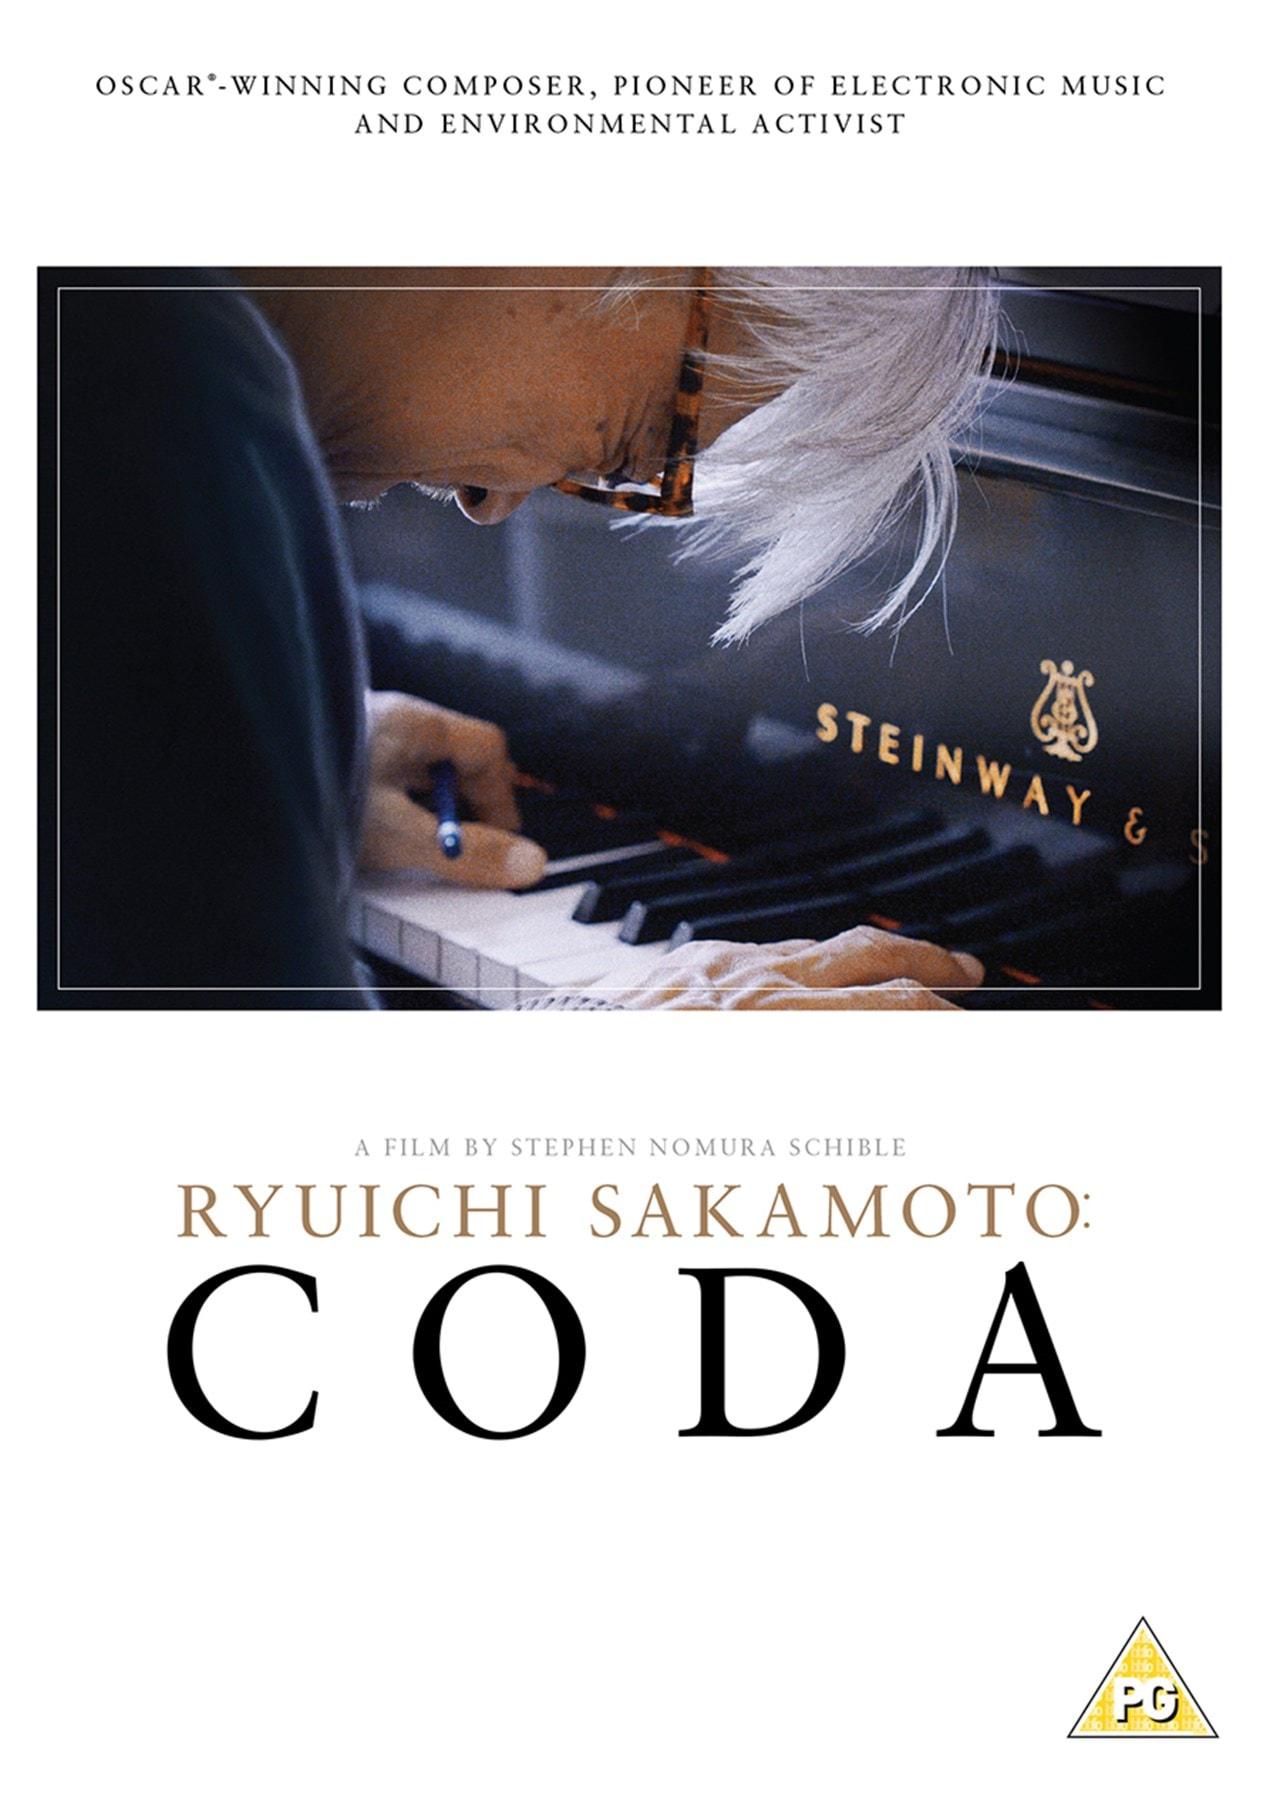 Ryuichi Sakamoto: Coda - 1